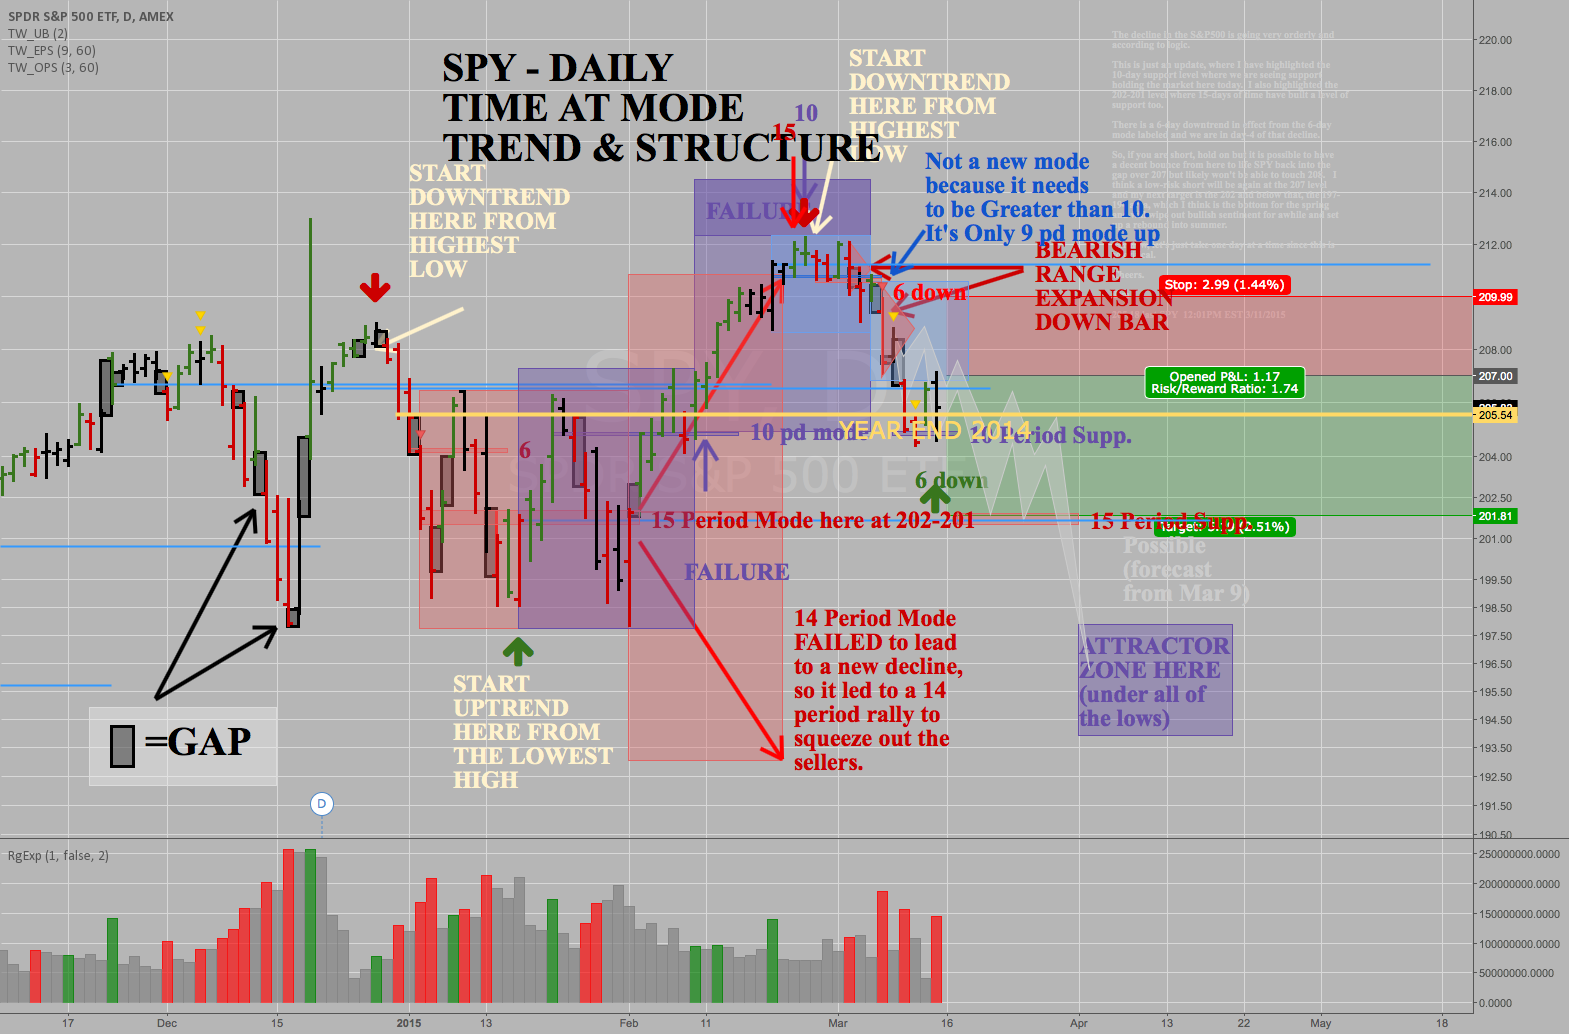 SPY S&P500 - RIGHT ON TARGET SO FAR